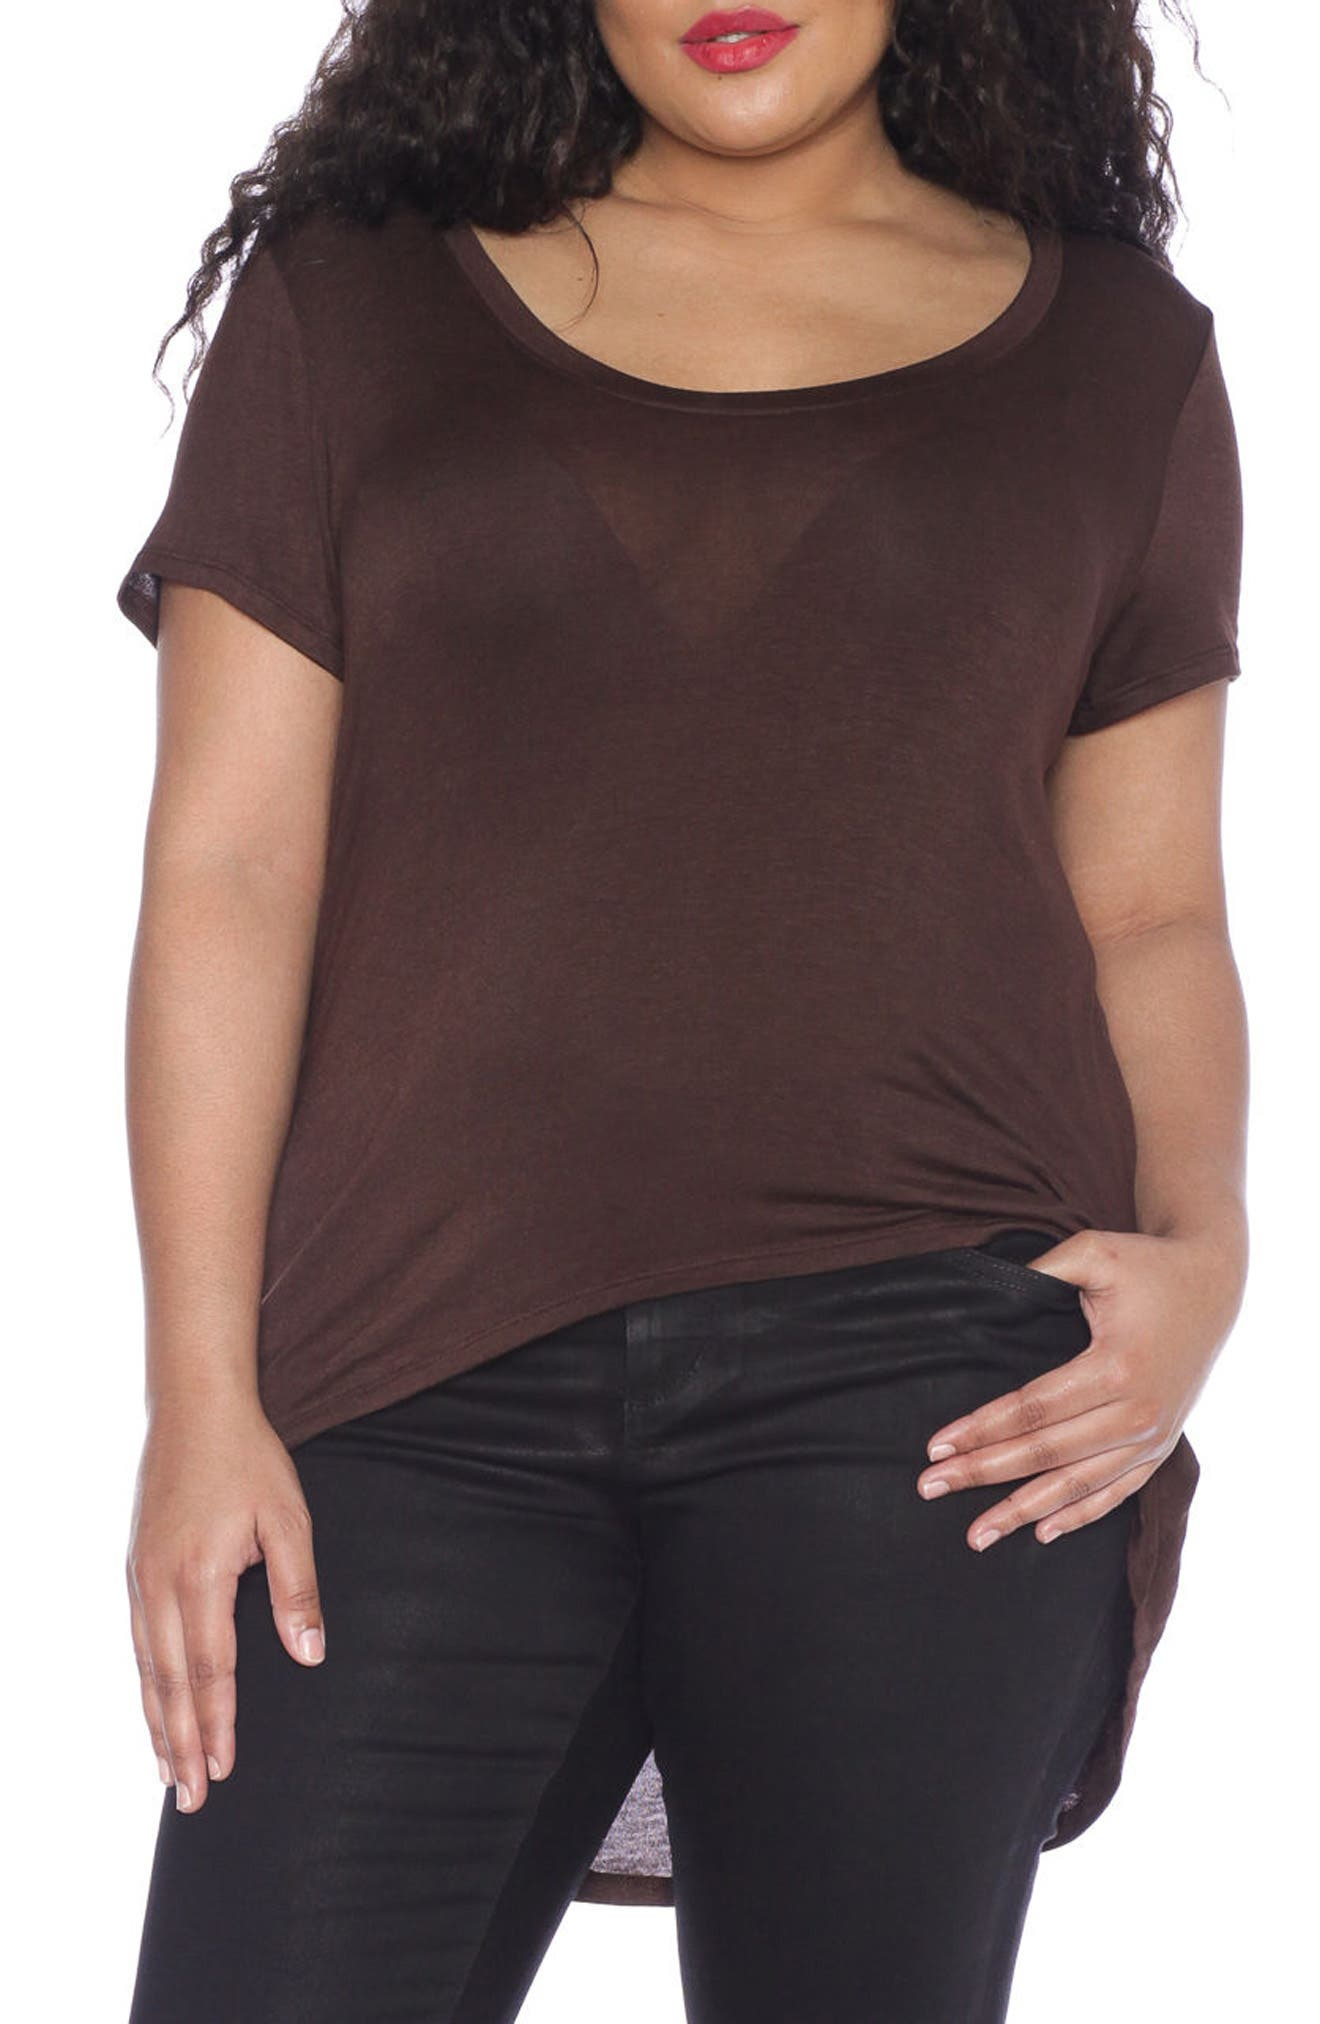 Alternate Image 1 Selected - SLINK Jeans High/Low Scoop Neck Tee (Plus Size)